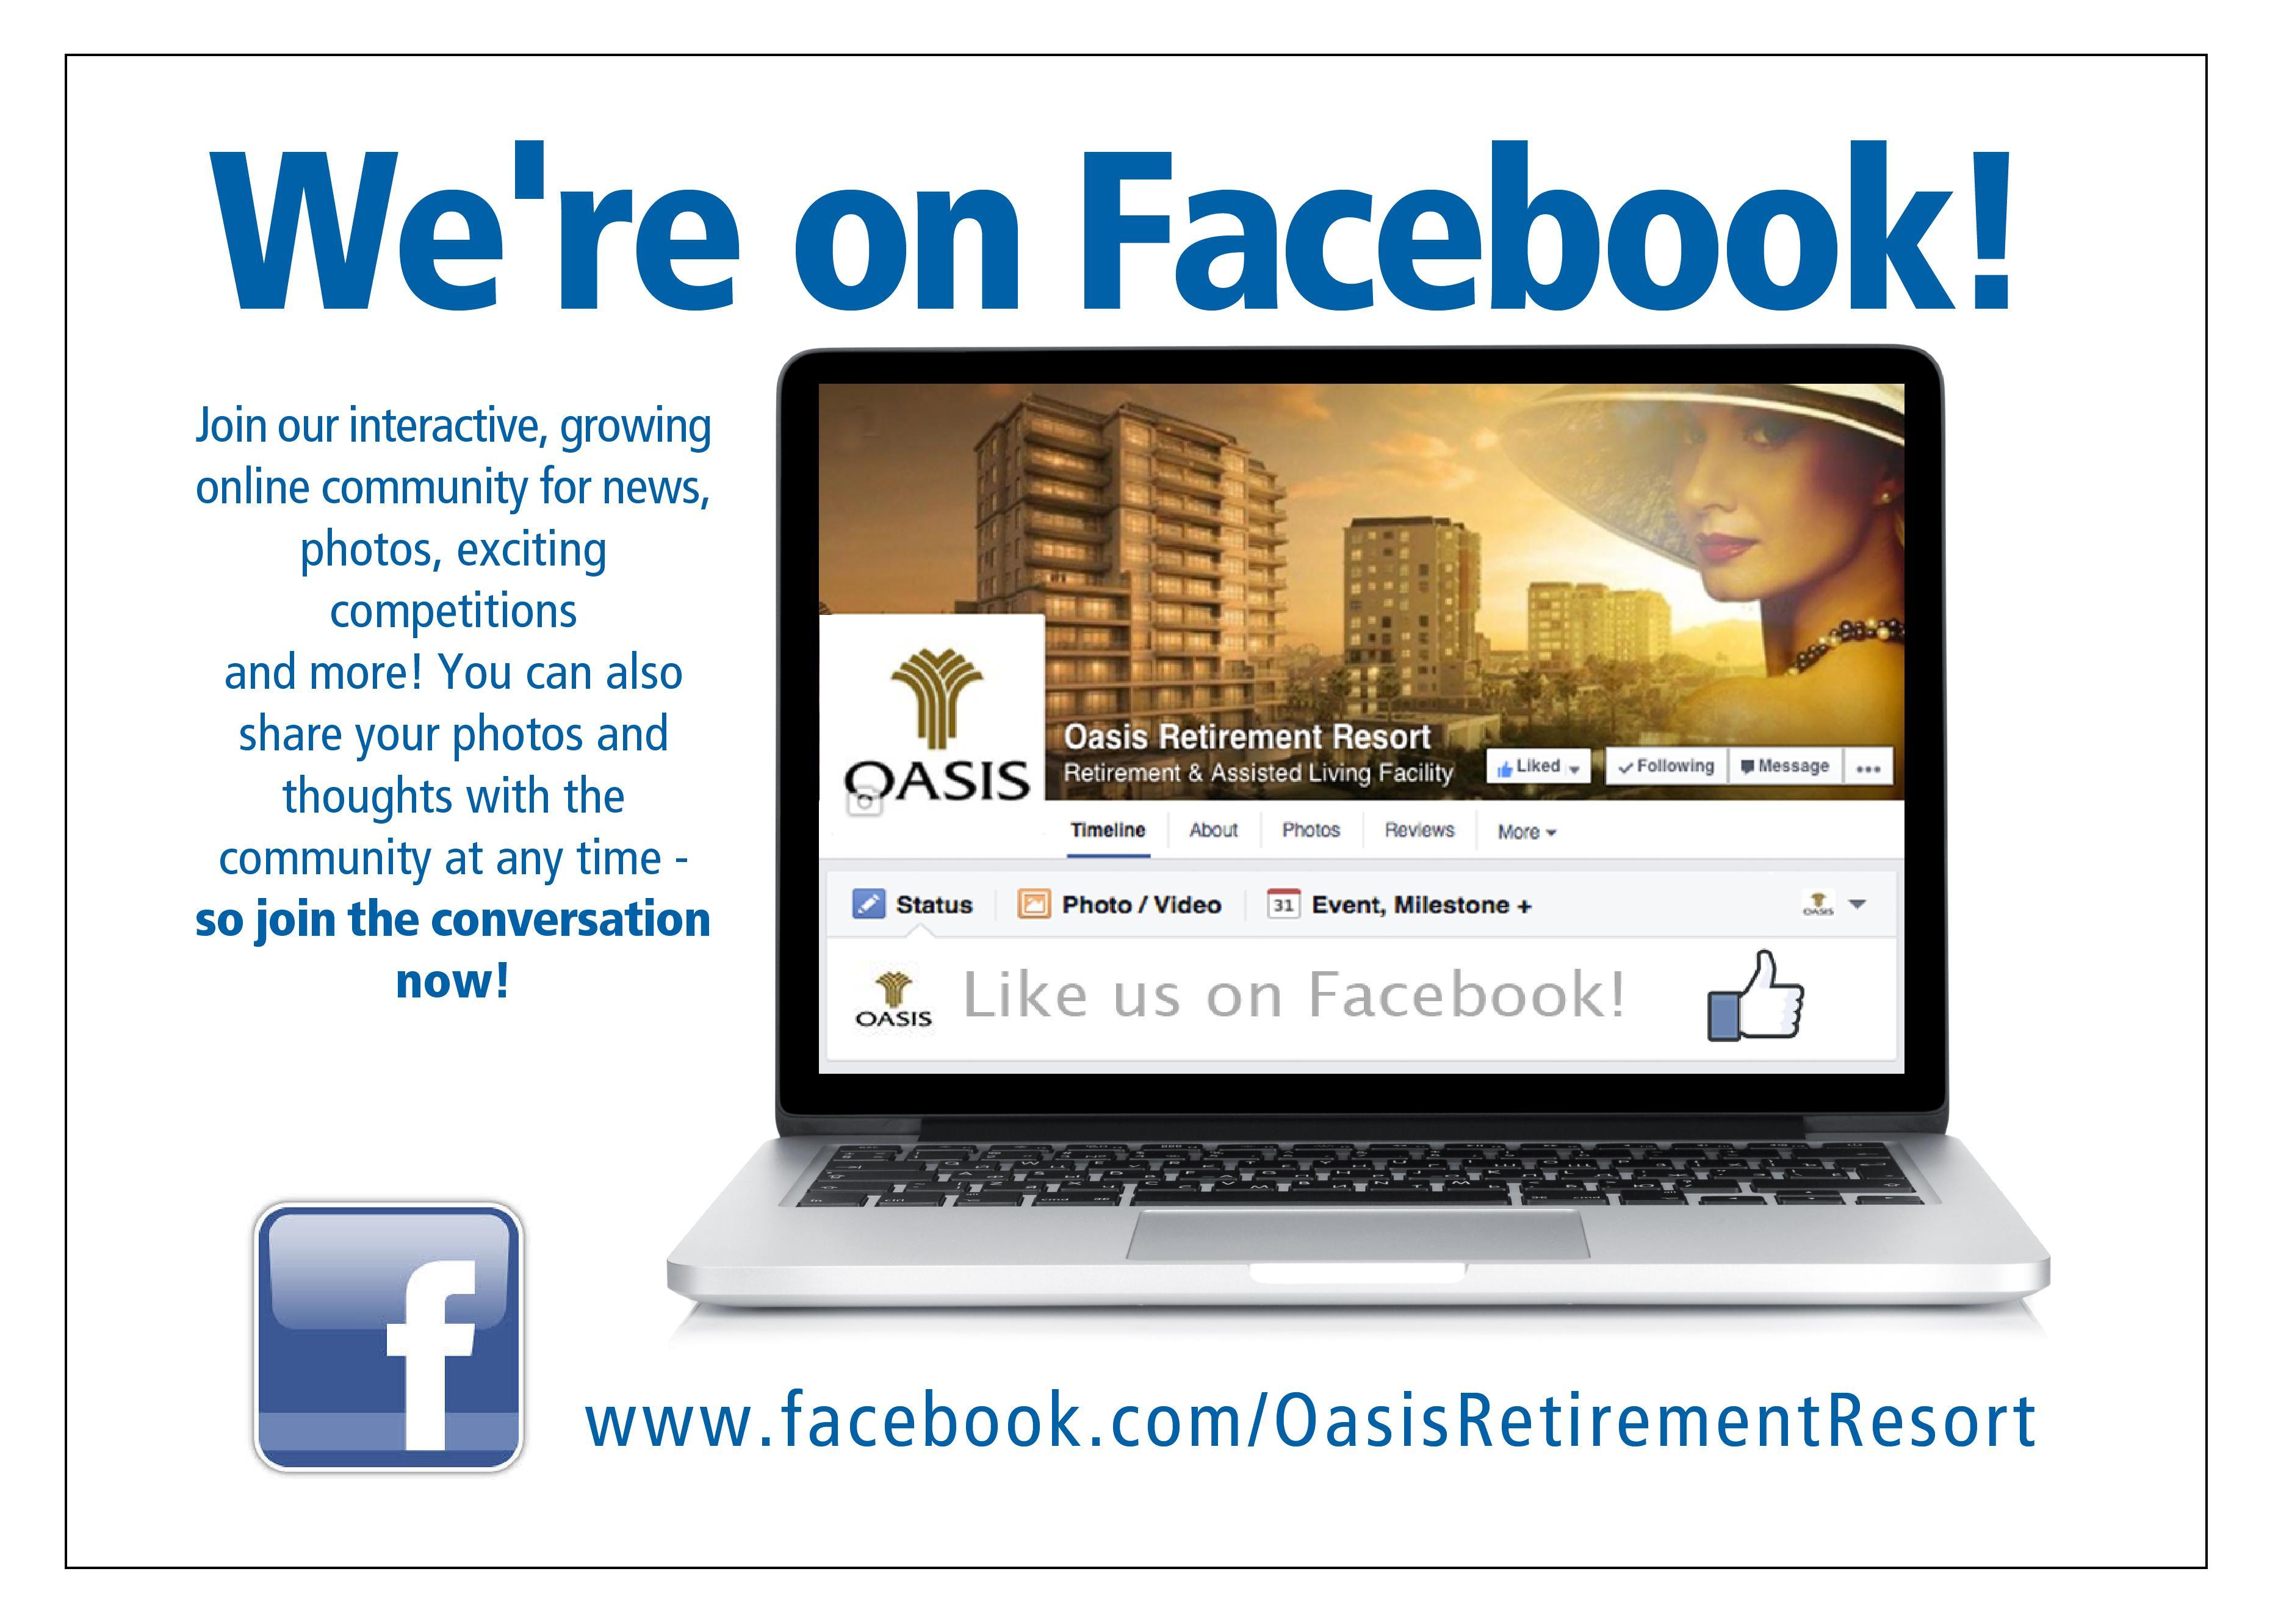 face book oasis